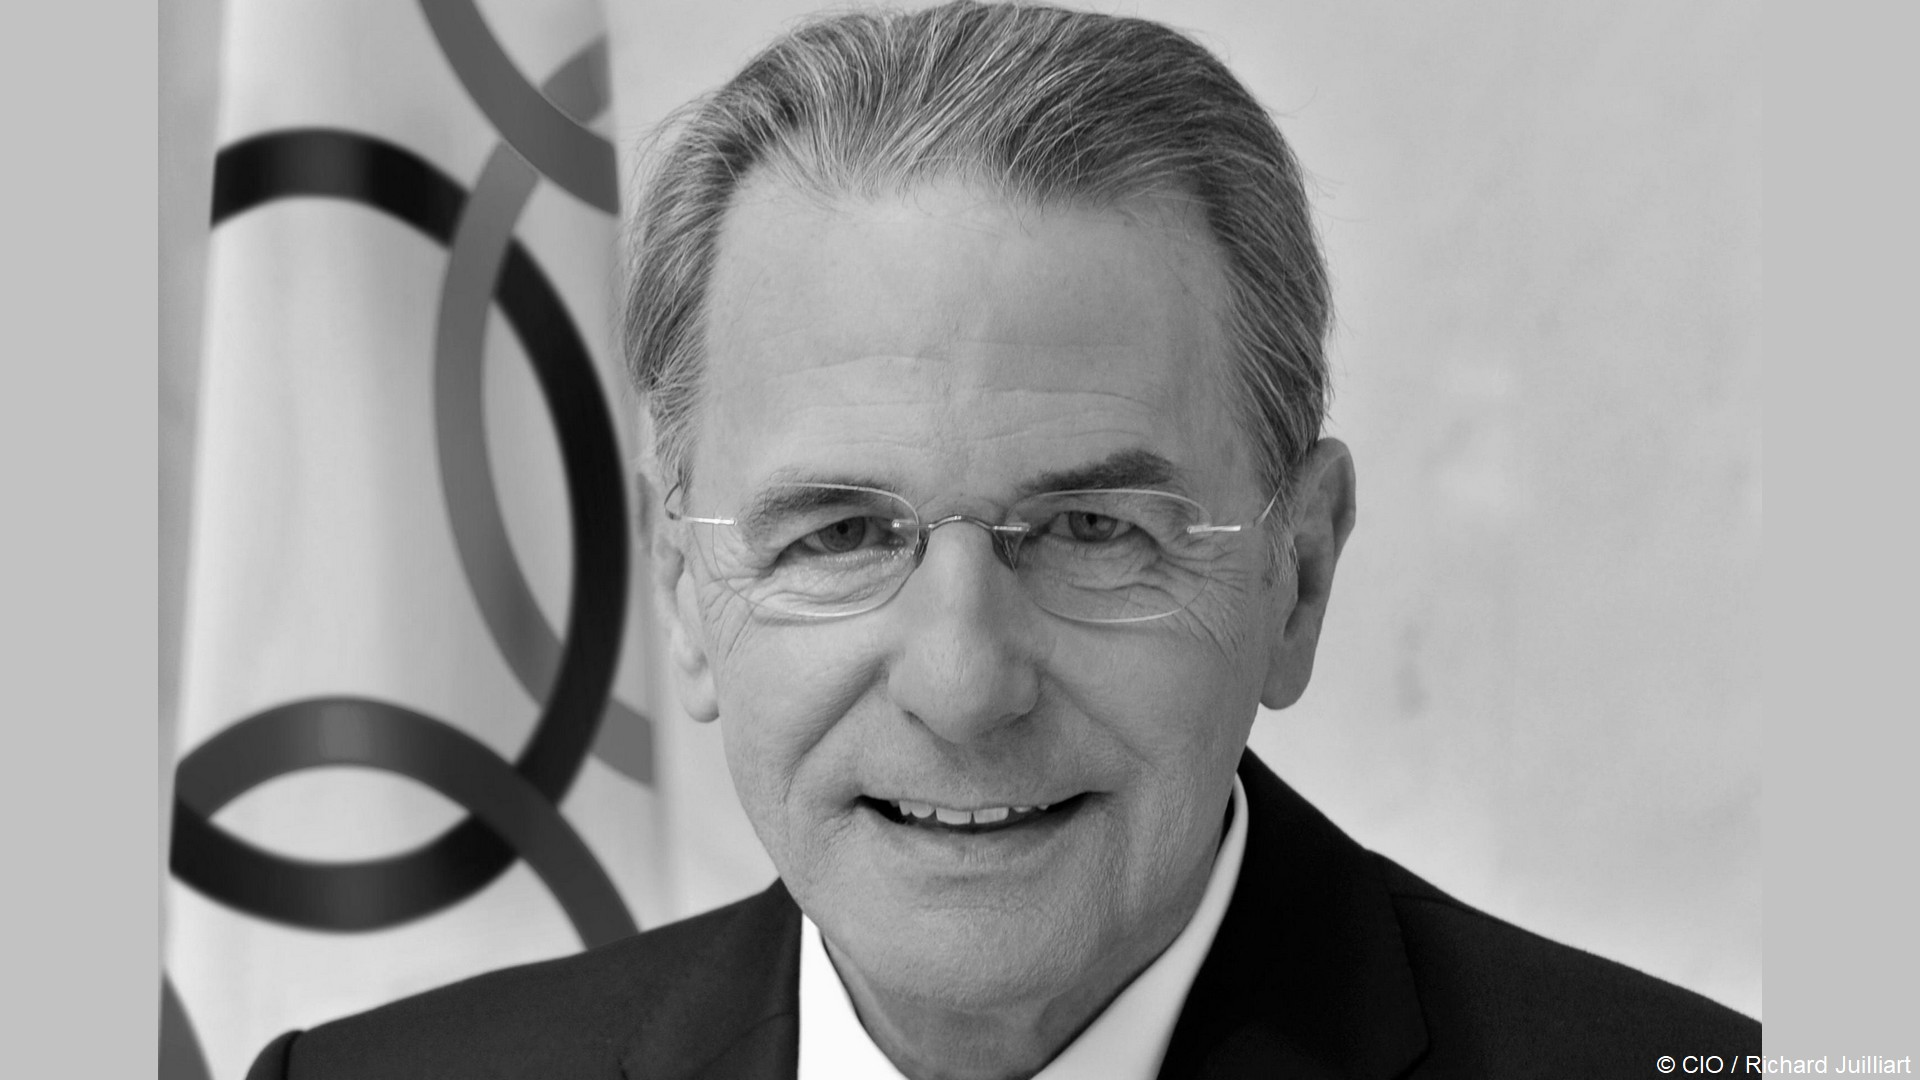 Rogge Jacques (1) CIO